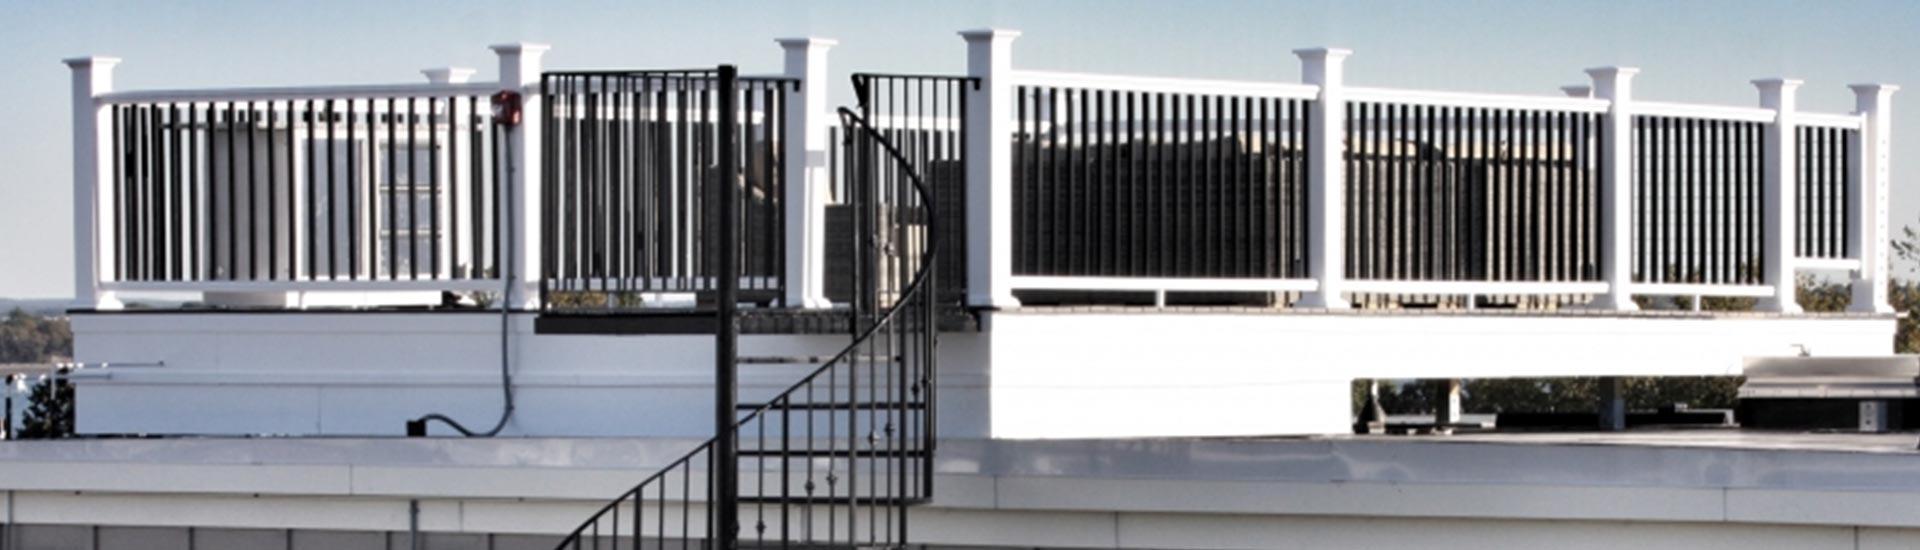 roof-deck-12